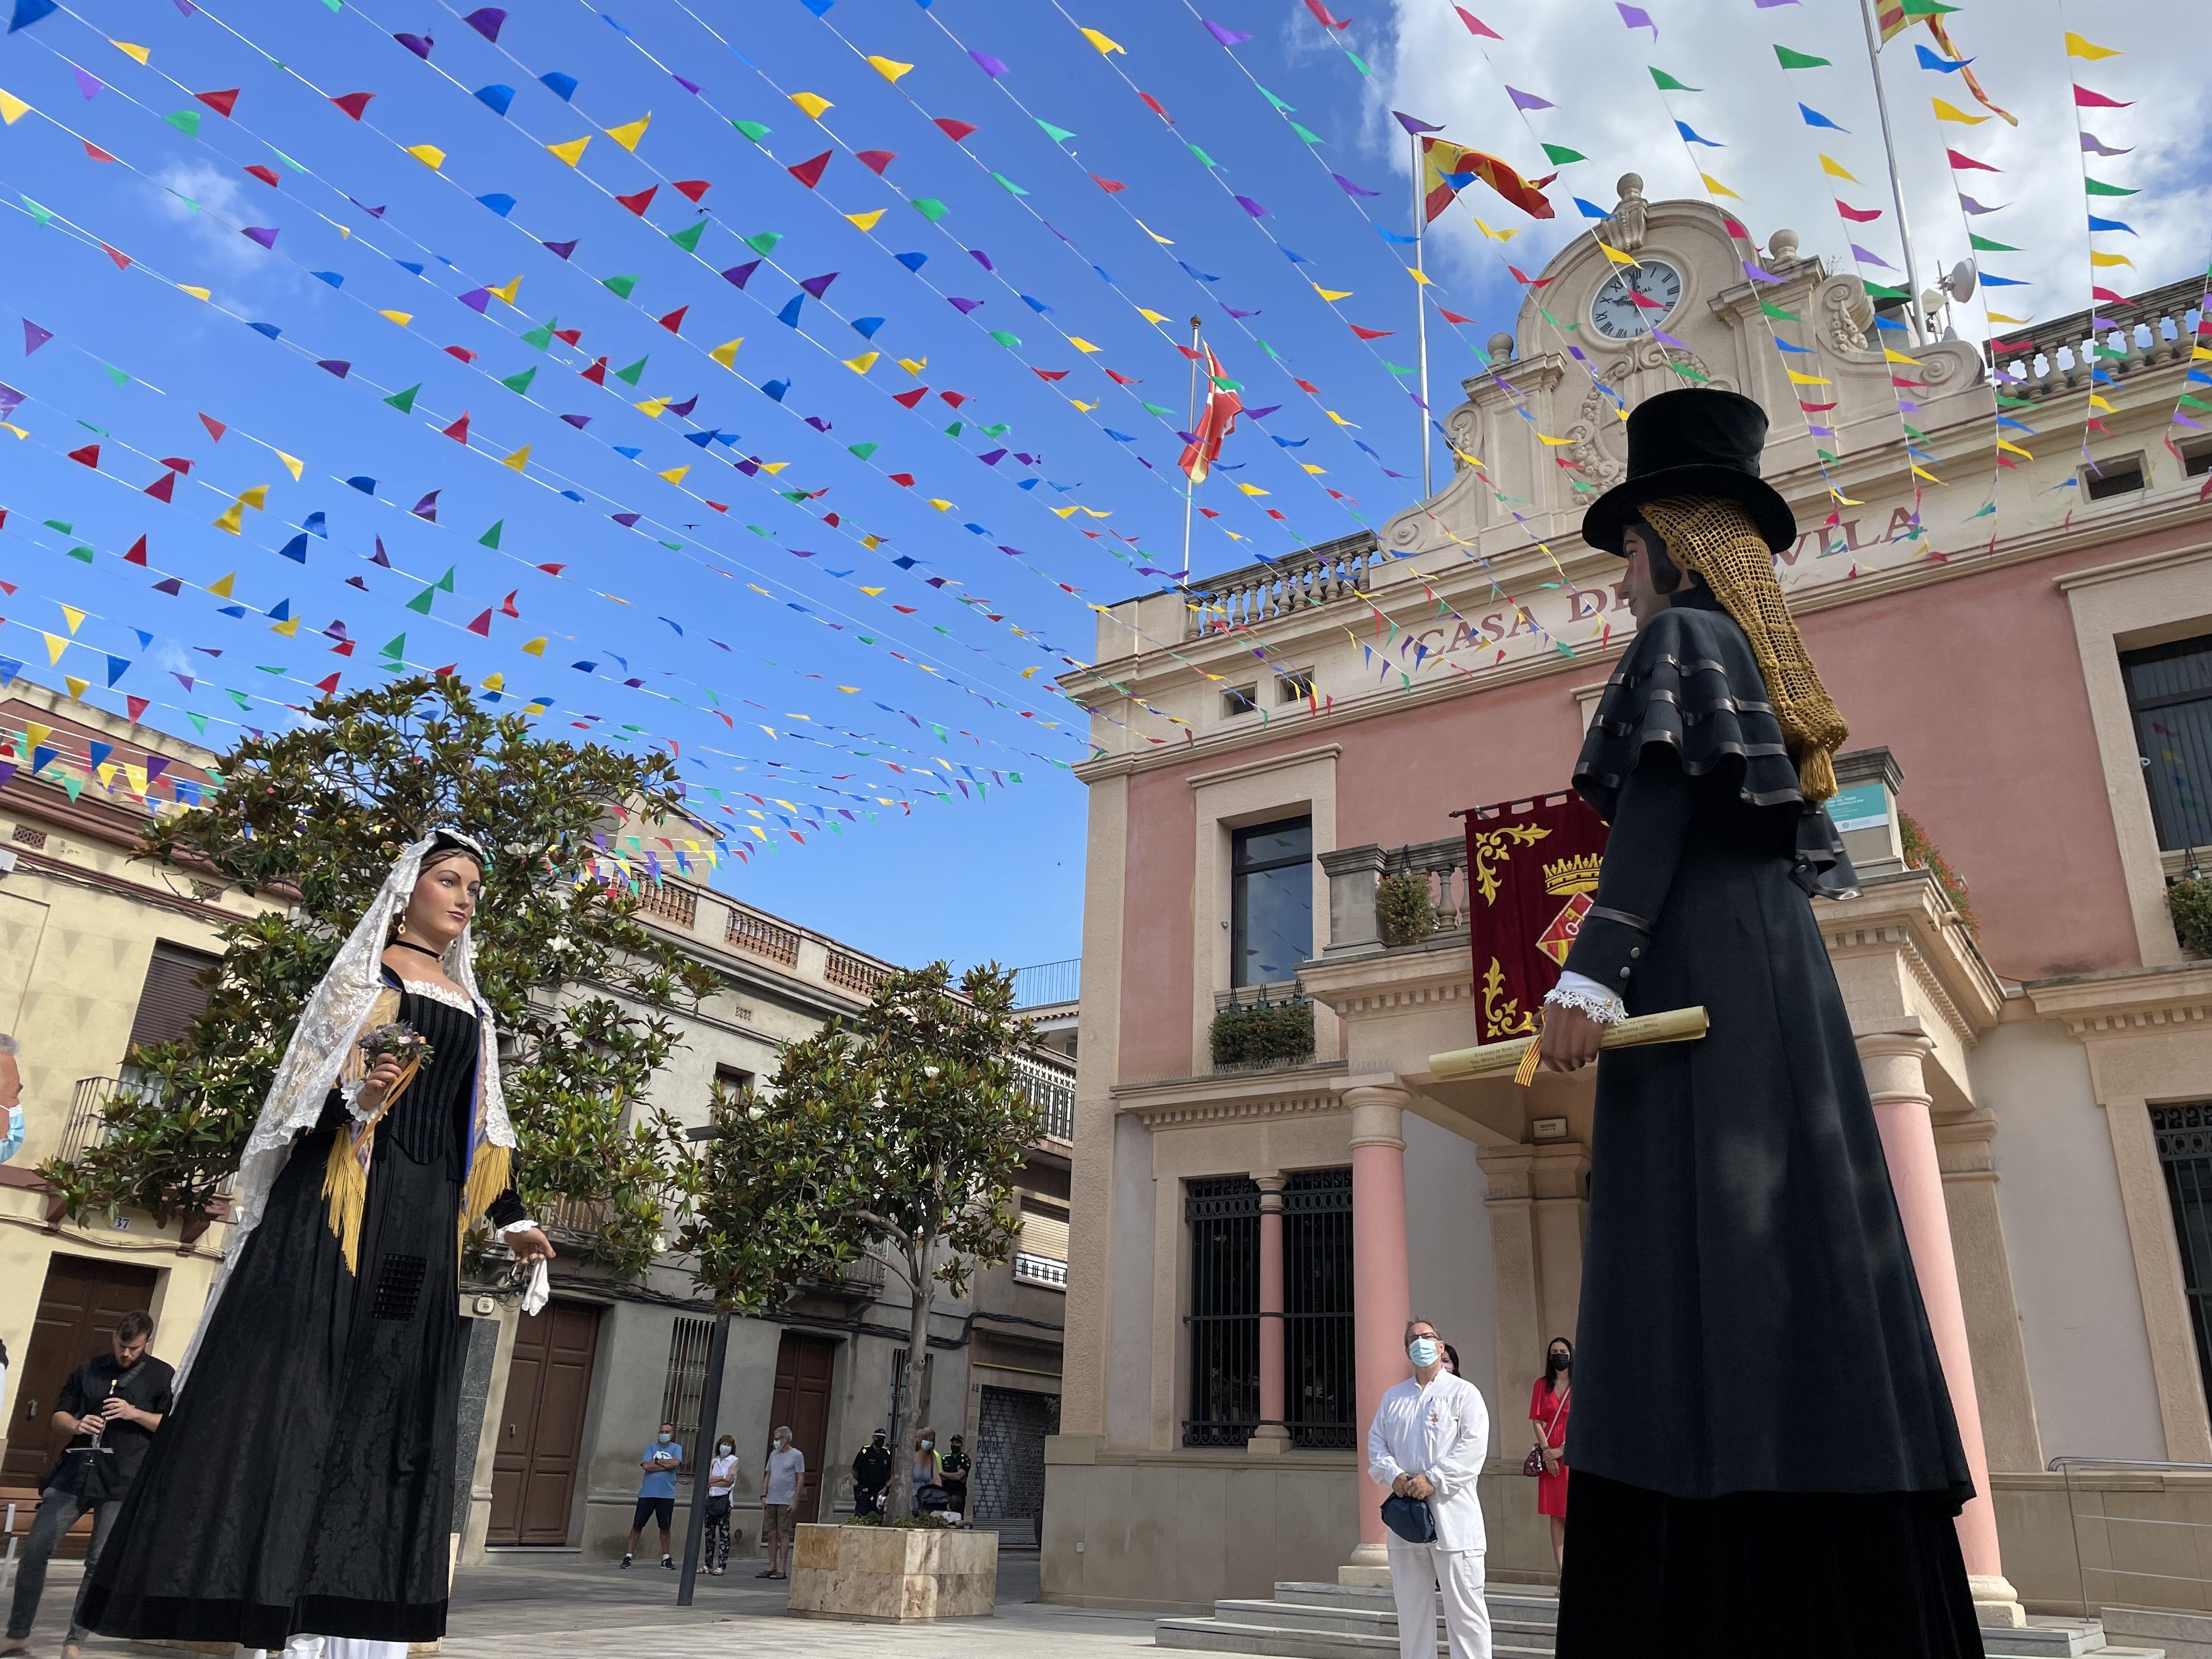 Despertada i plantada de gegants per Festa Major. FOTO: Núria Hueso